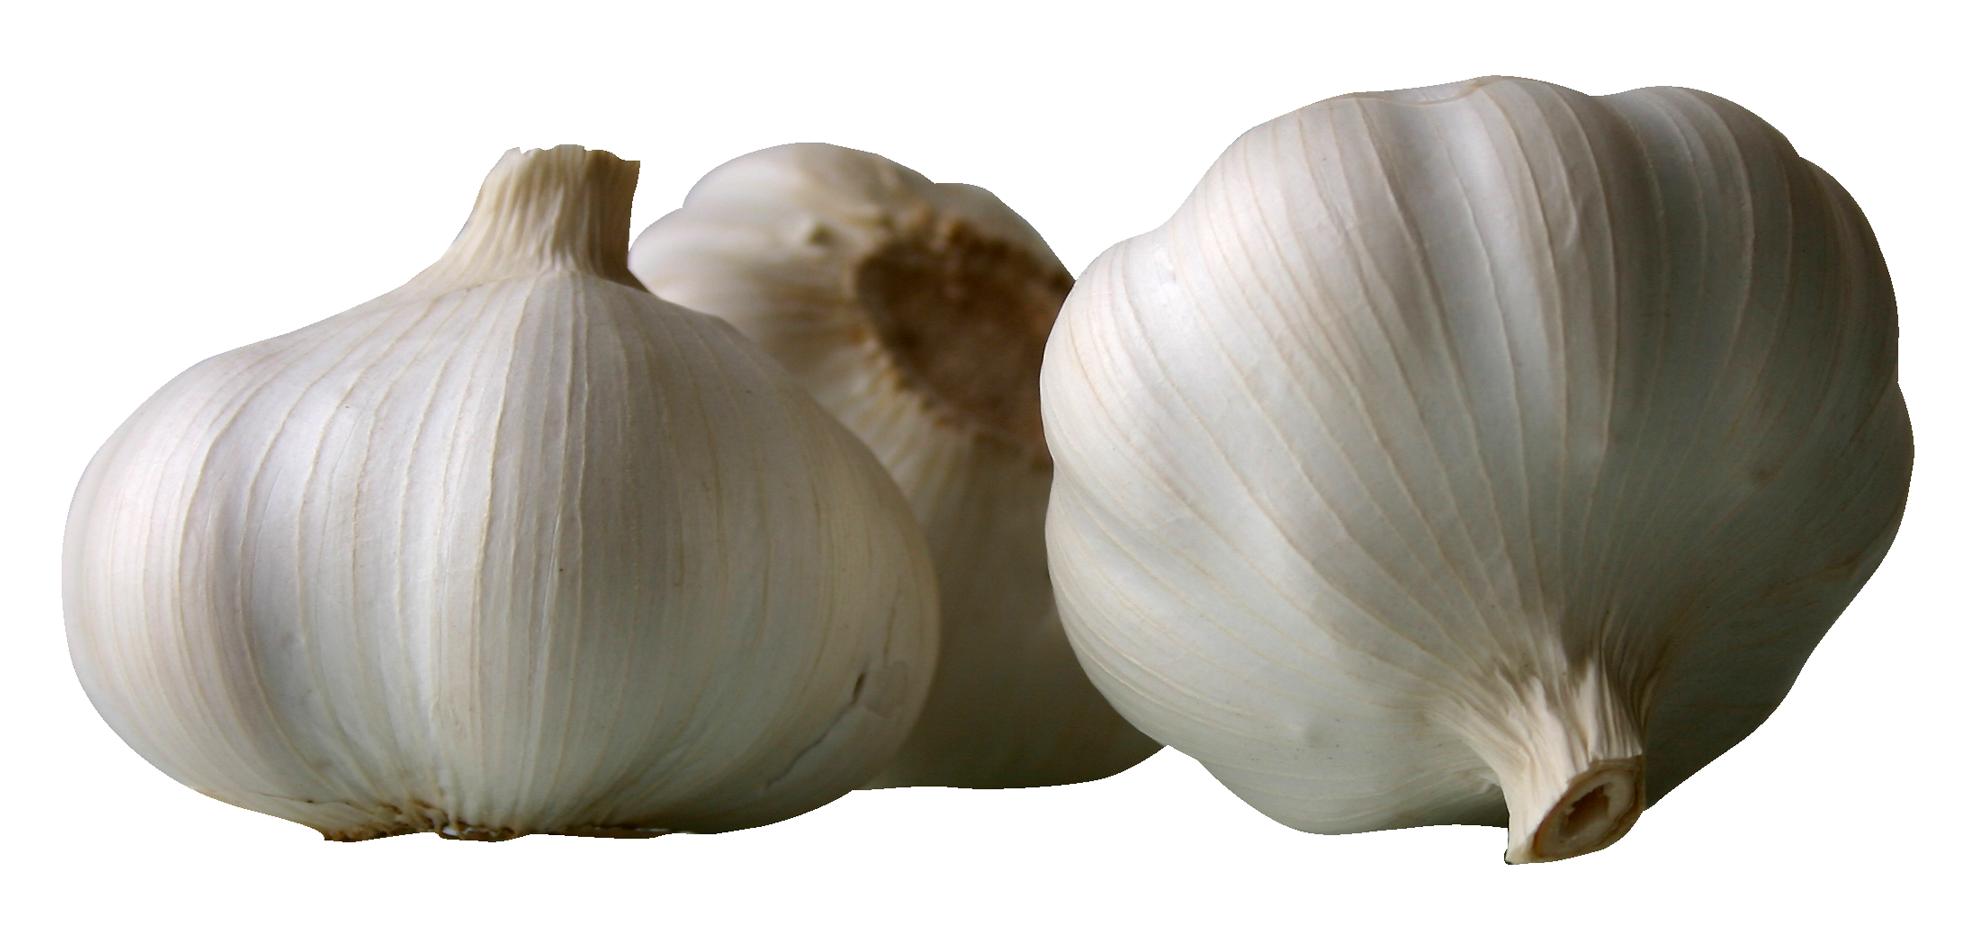 Garlics PNG Image